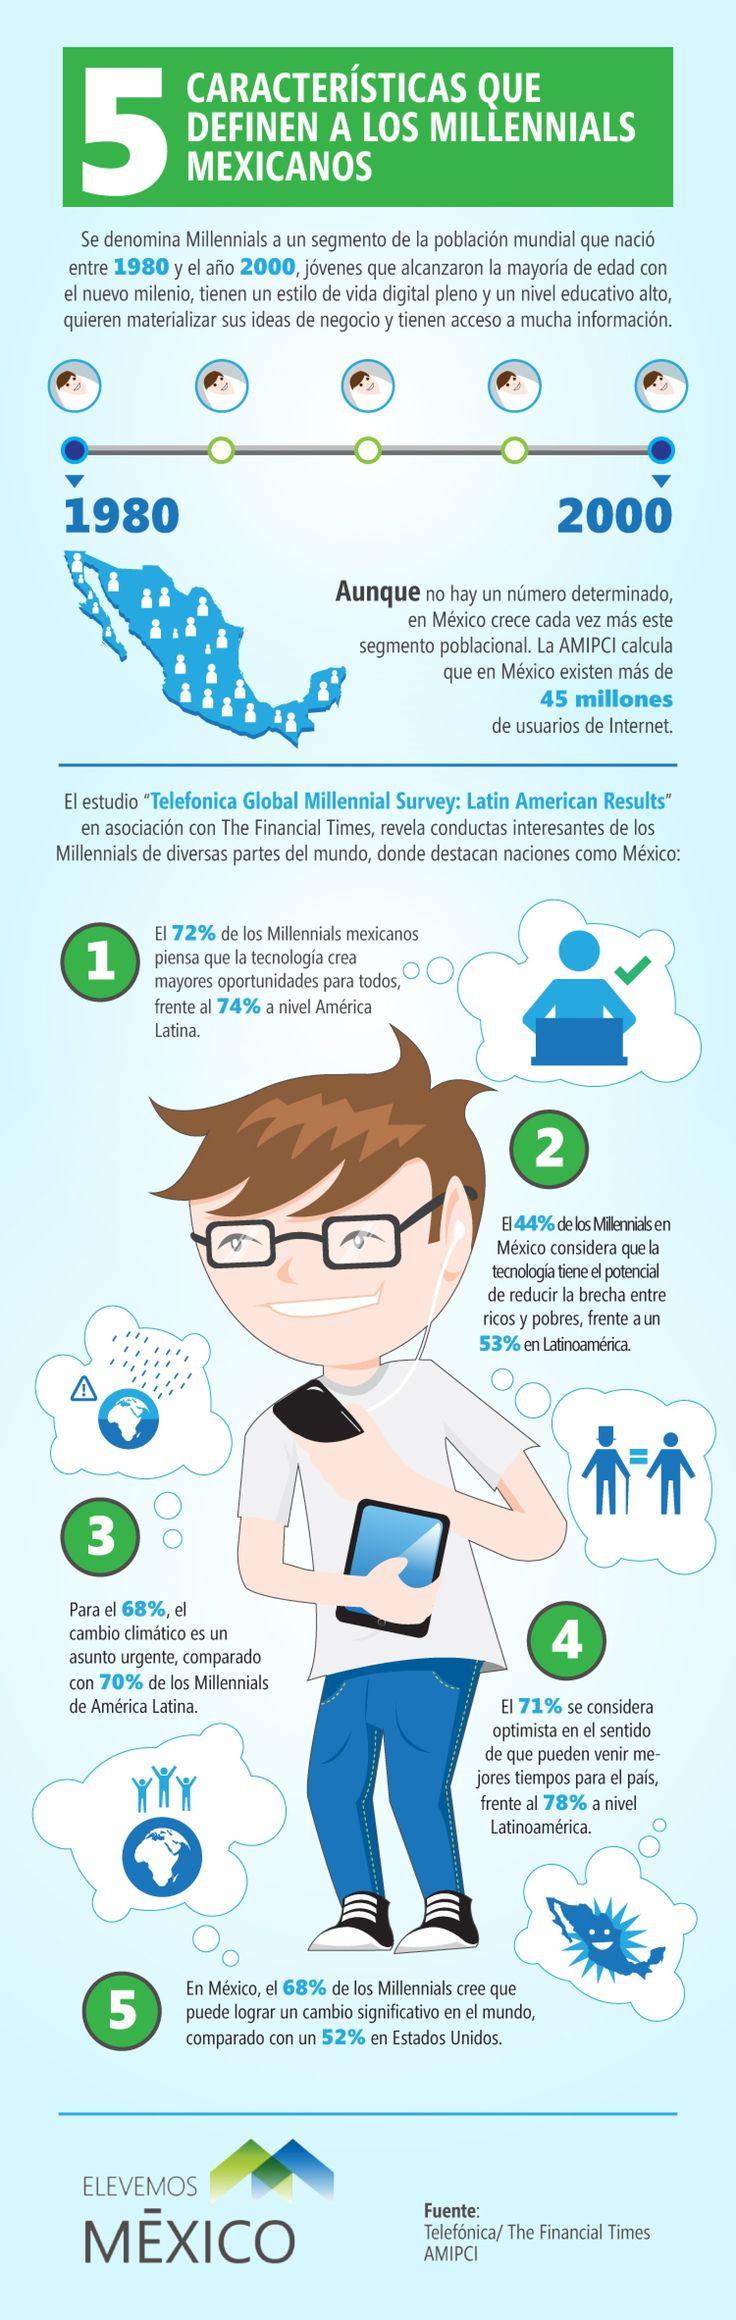 cinco caractaristicas de los millennials